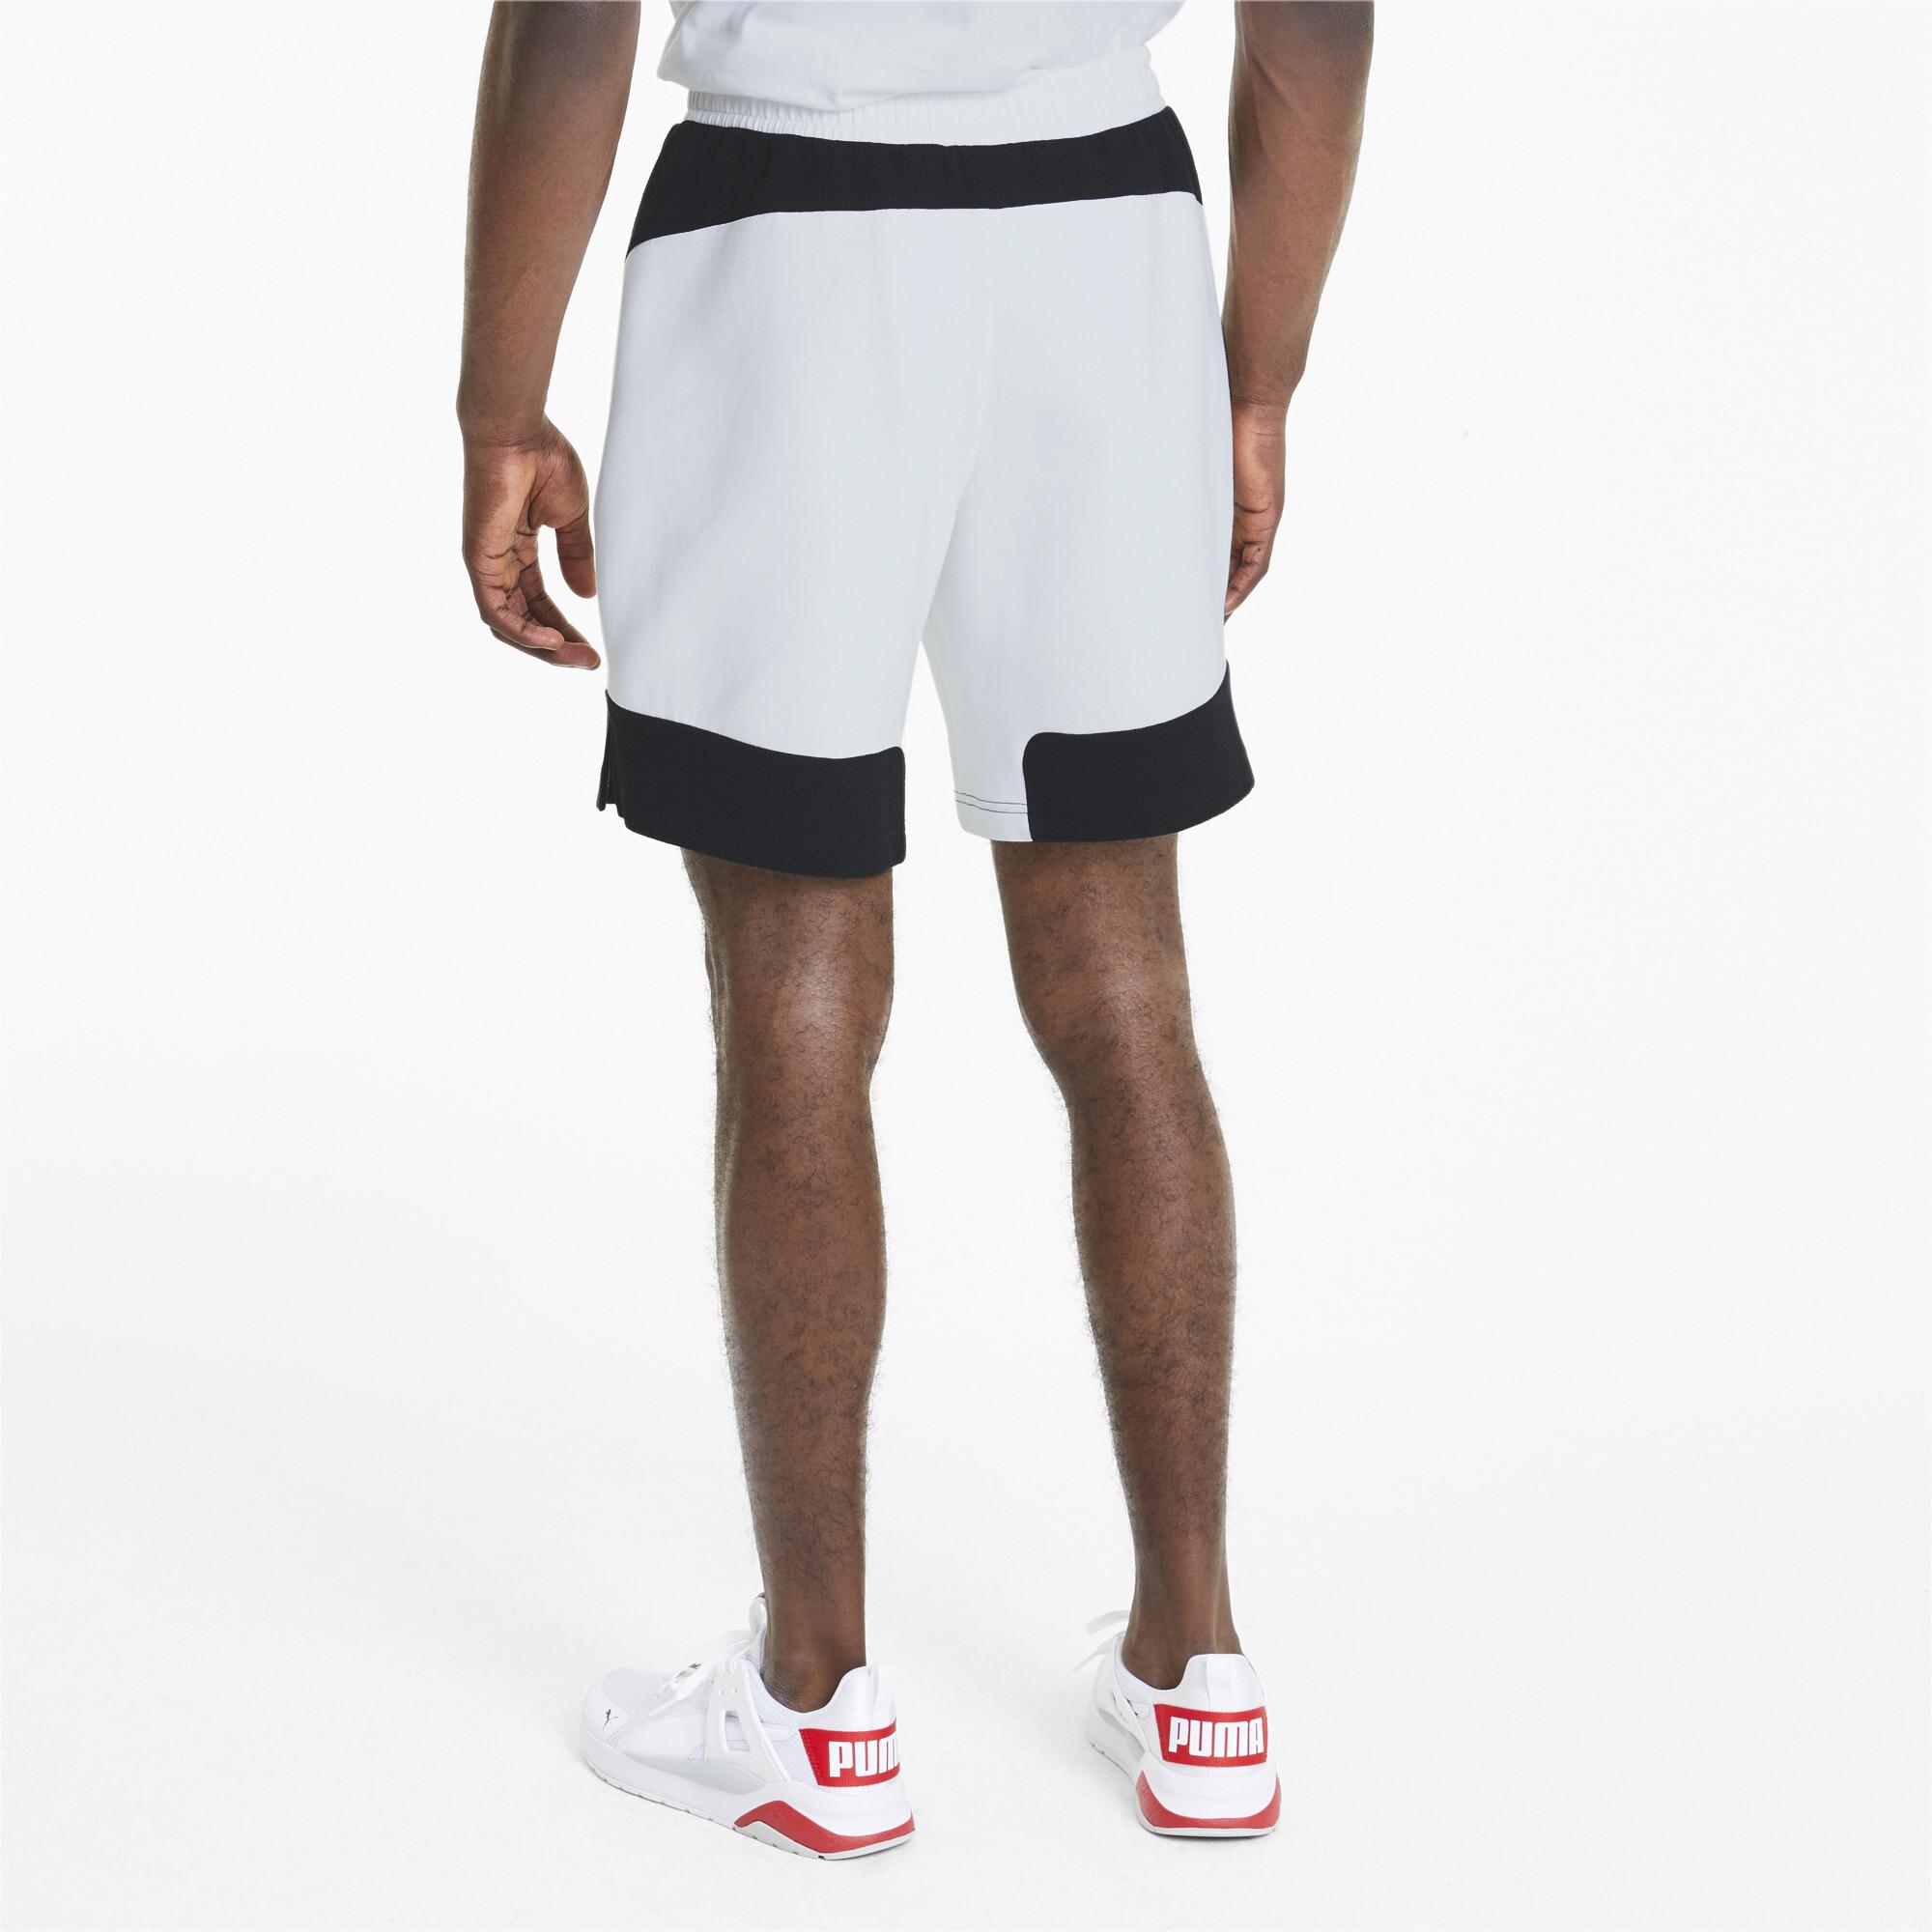 PUMA-Evostripe-Men-039-s-Shorts-Men-Knitted-Shorts-Basics thumbnail 21